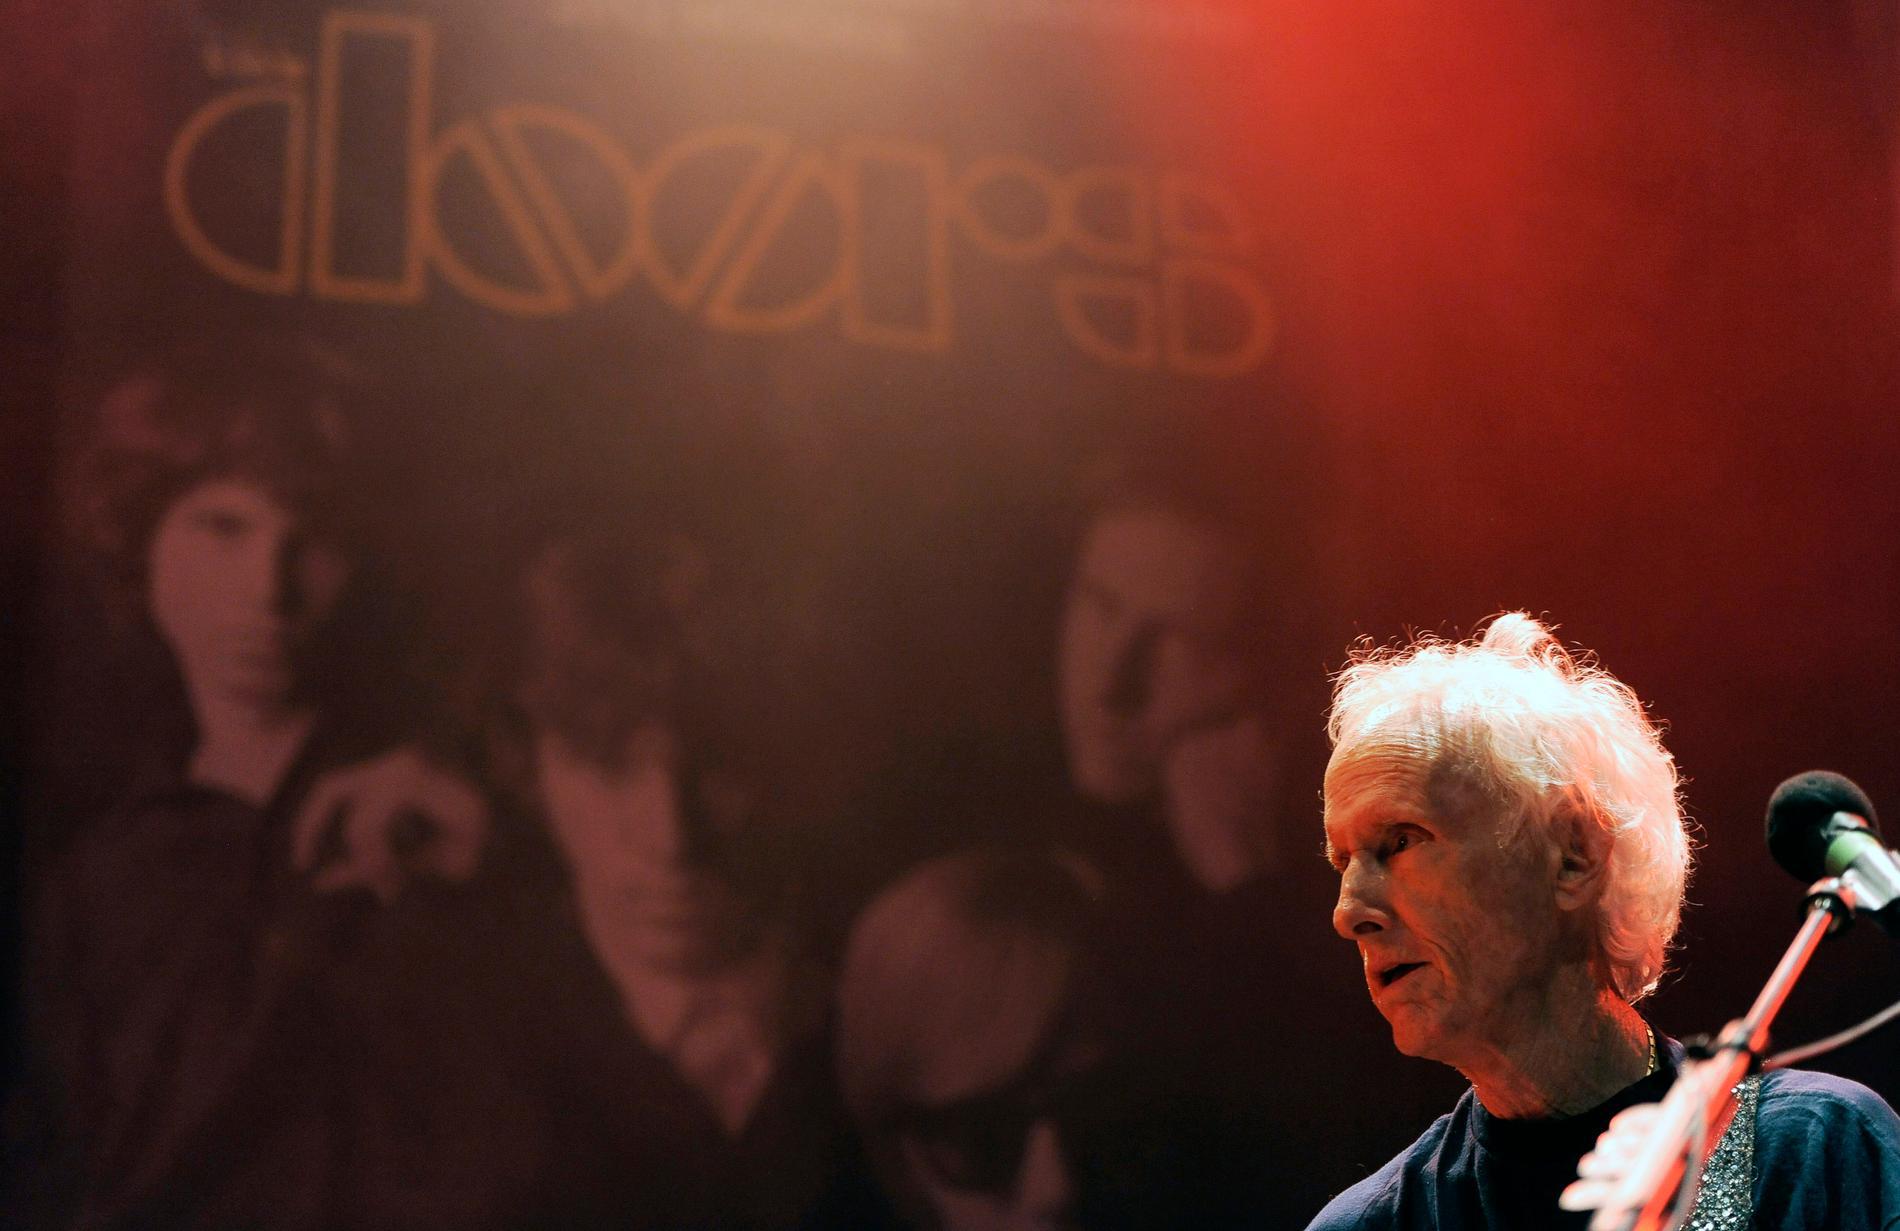 Robby Krieger, gitarrist i The Doors, släpper sina memoarer i oktober. Arkivbild.